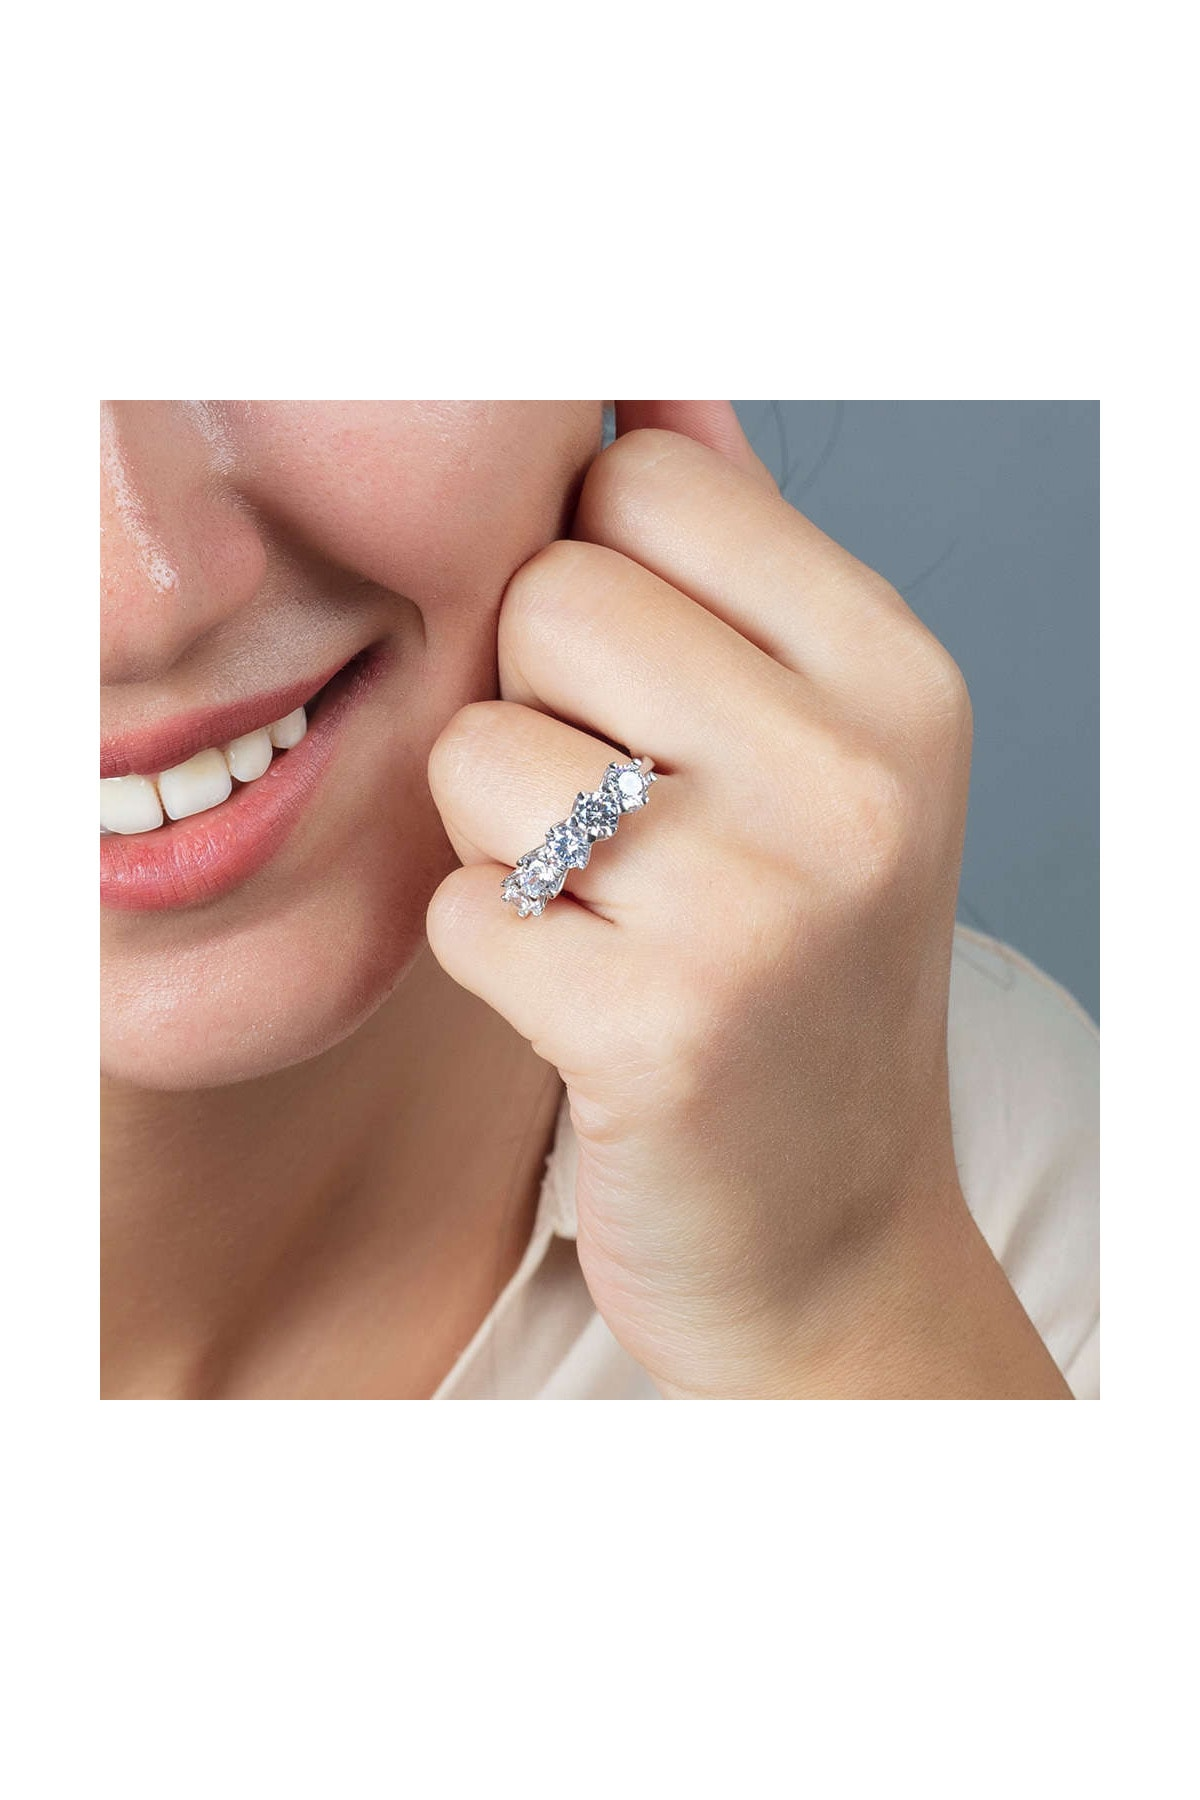 Tesbihane Starlight Diamond Pırlanta Montür 925 Ayar Gümüş Bayan Beştaş Yüzük 102001816 2